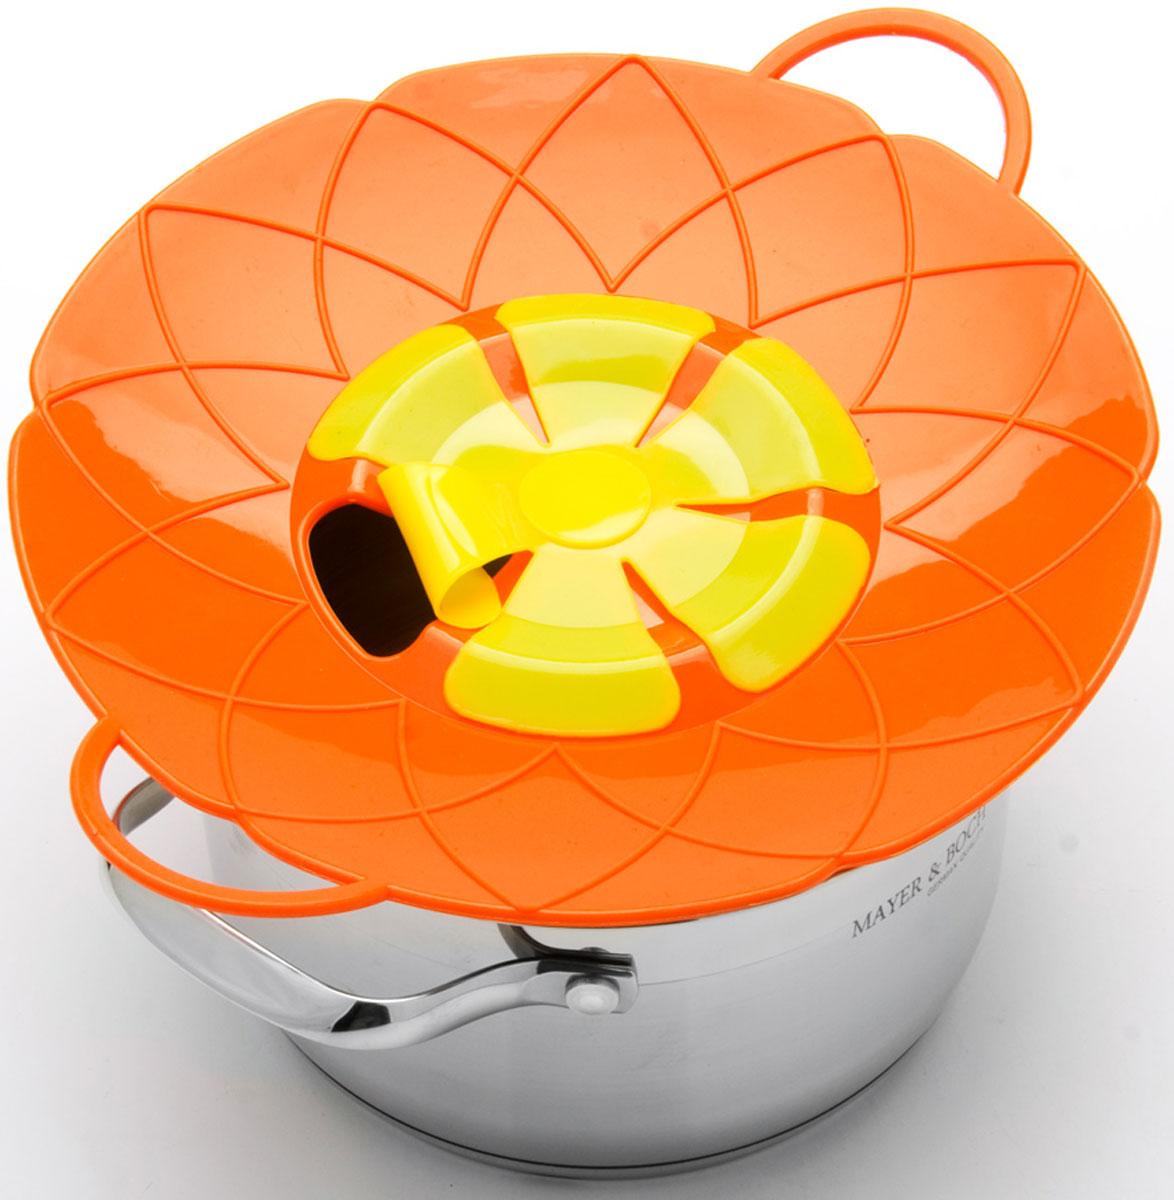 "Крышка-невыкипайка ""Mayer & Boch"", цвет: оранжевый, желтый, диаметр 25 см"